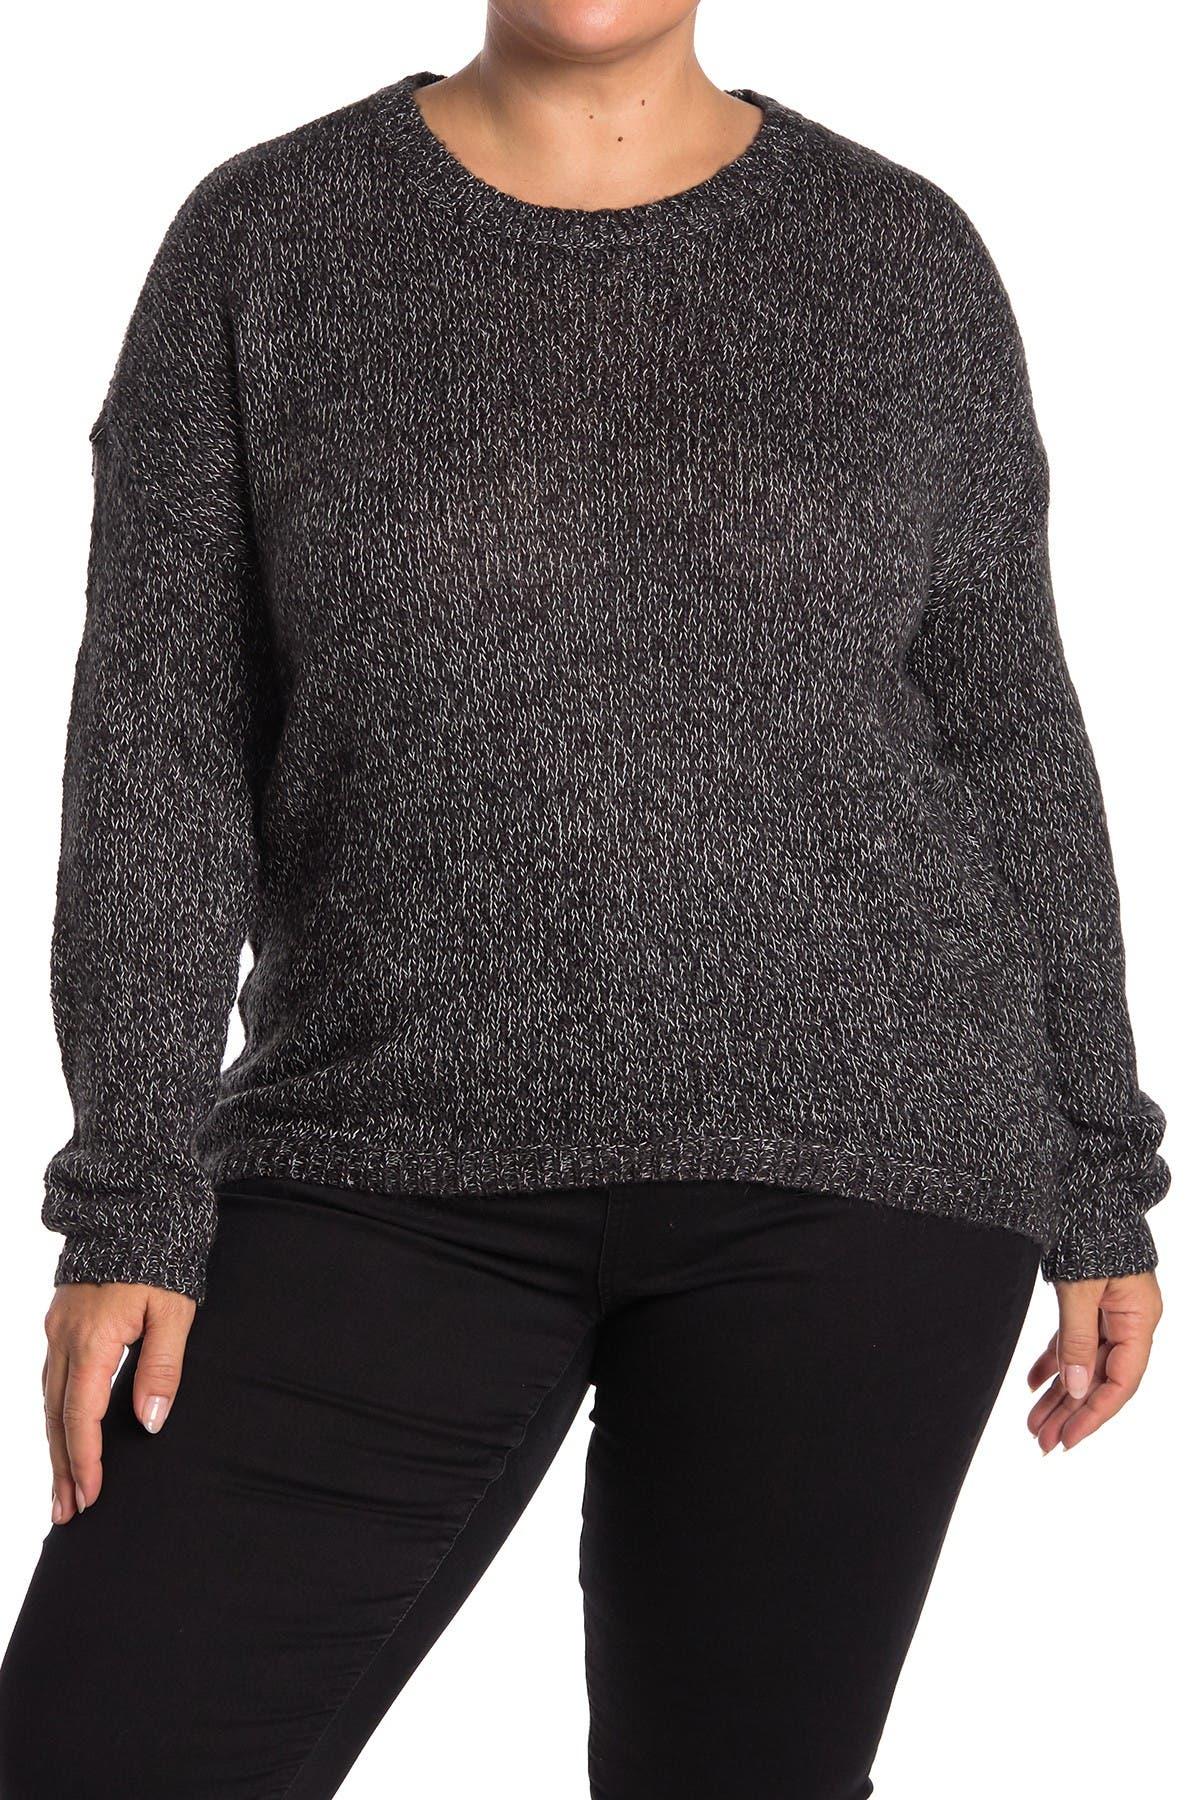 Image of VERO MODA Lisa Long Sleeve Sweater